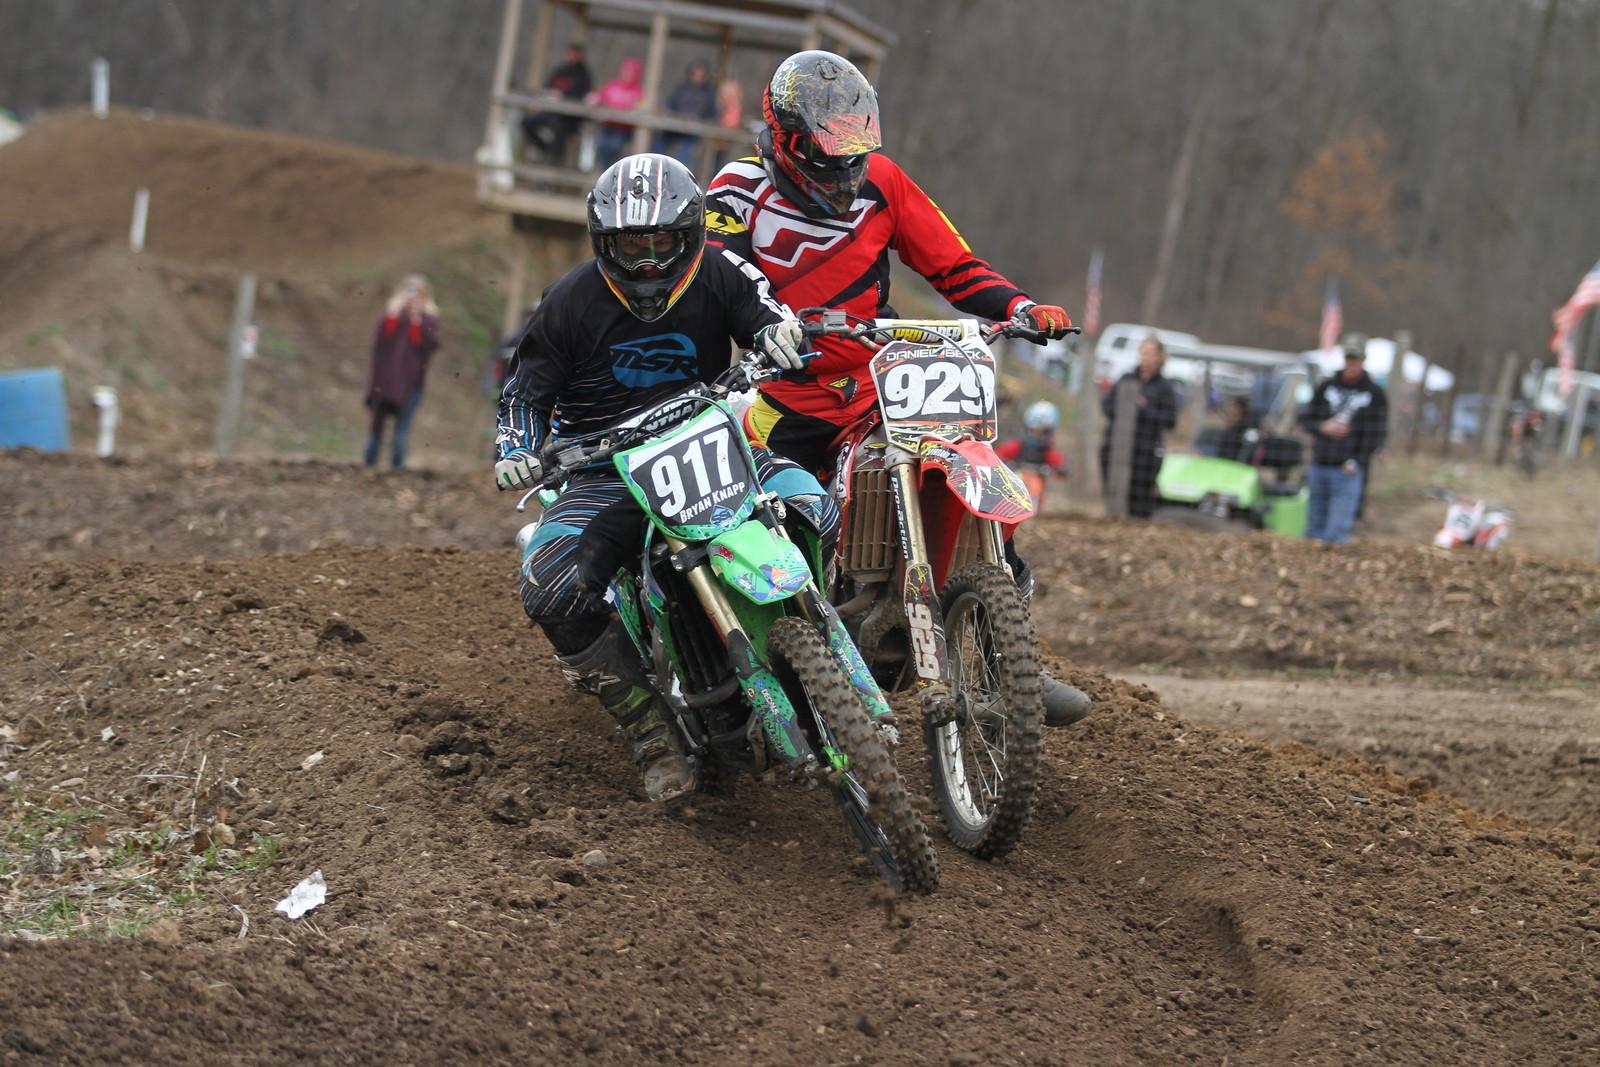 Bryan Knapp and Daniel Beck - midwest_moto_media - Motocross Pictures - Vital MX